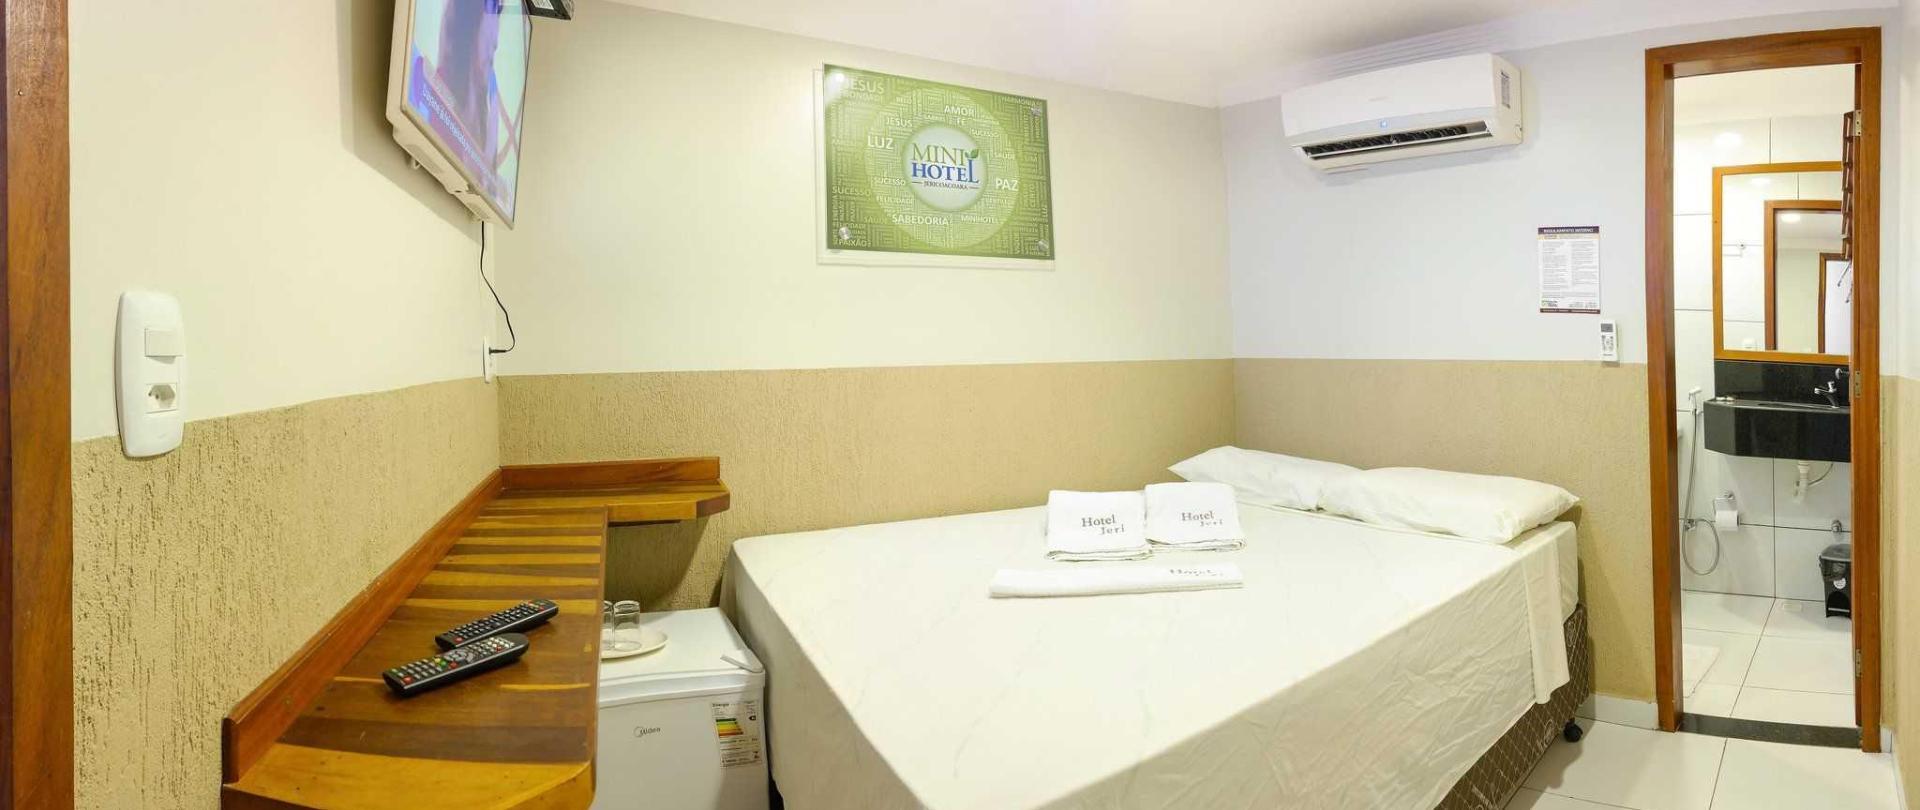 pn_mini_hotel_07.jpg